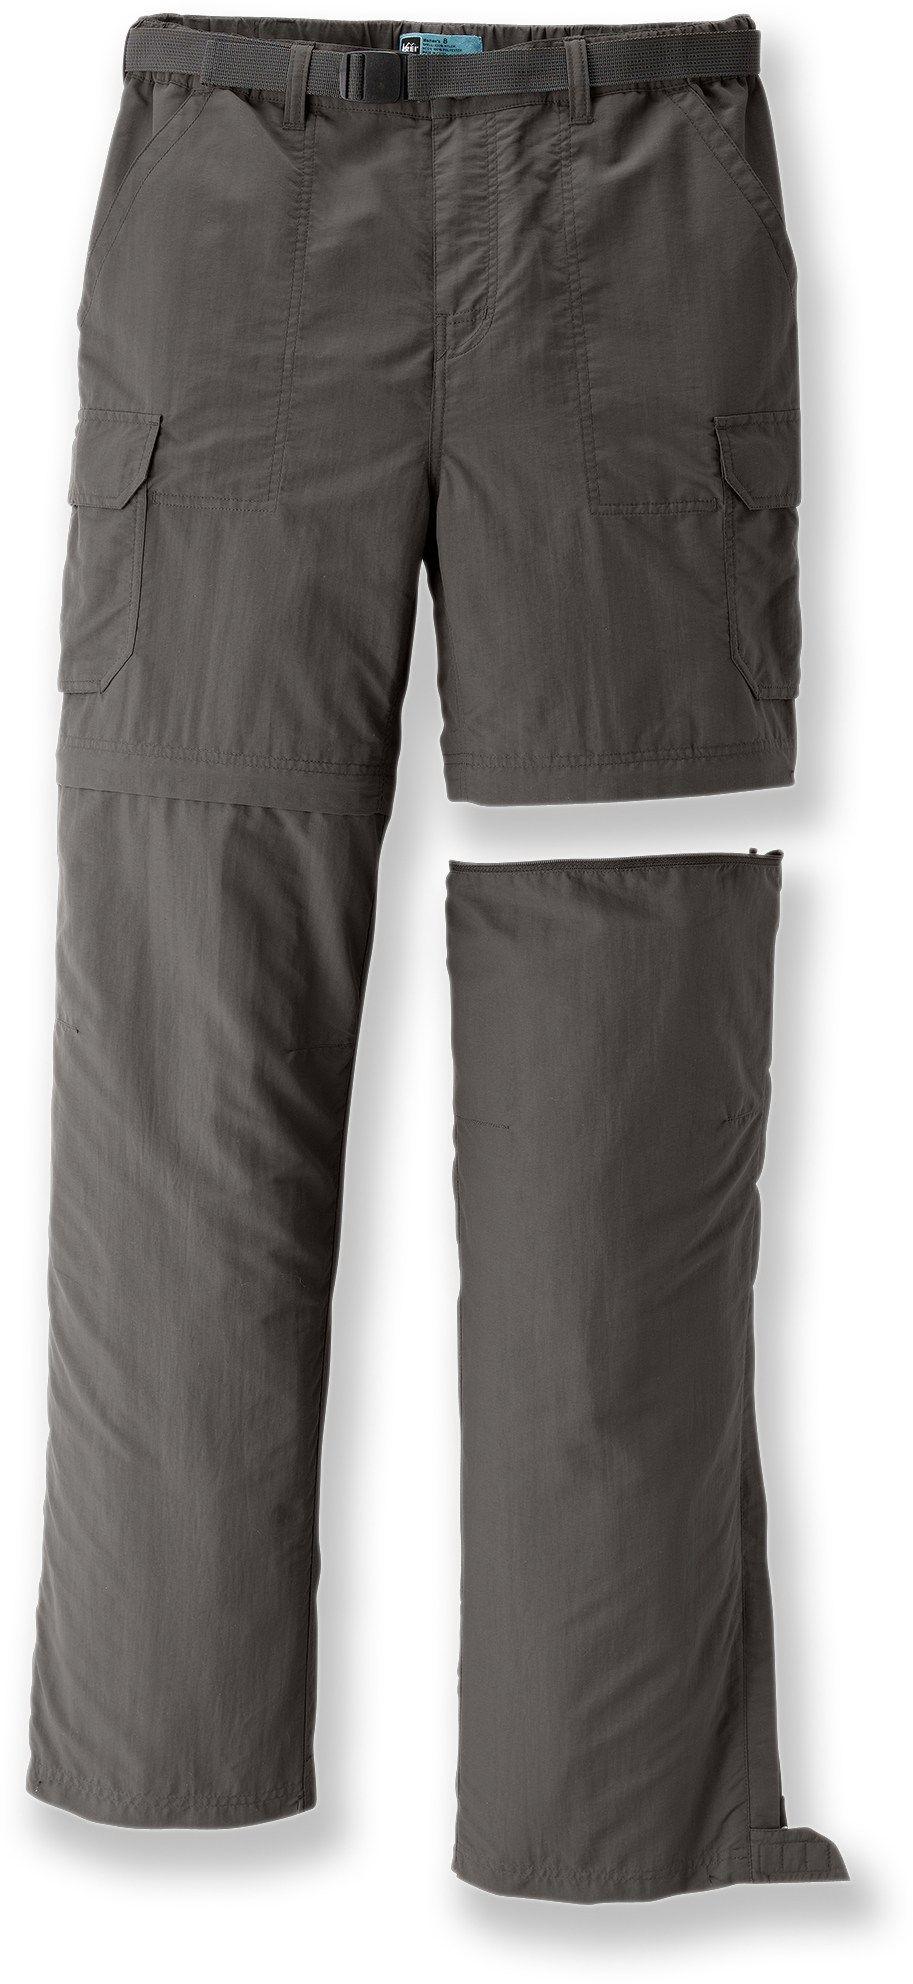 NAWONGSKY Womens Convertible Lightweight Quick Dry Pants